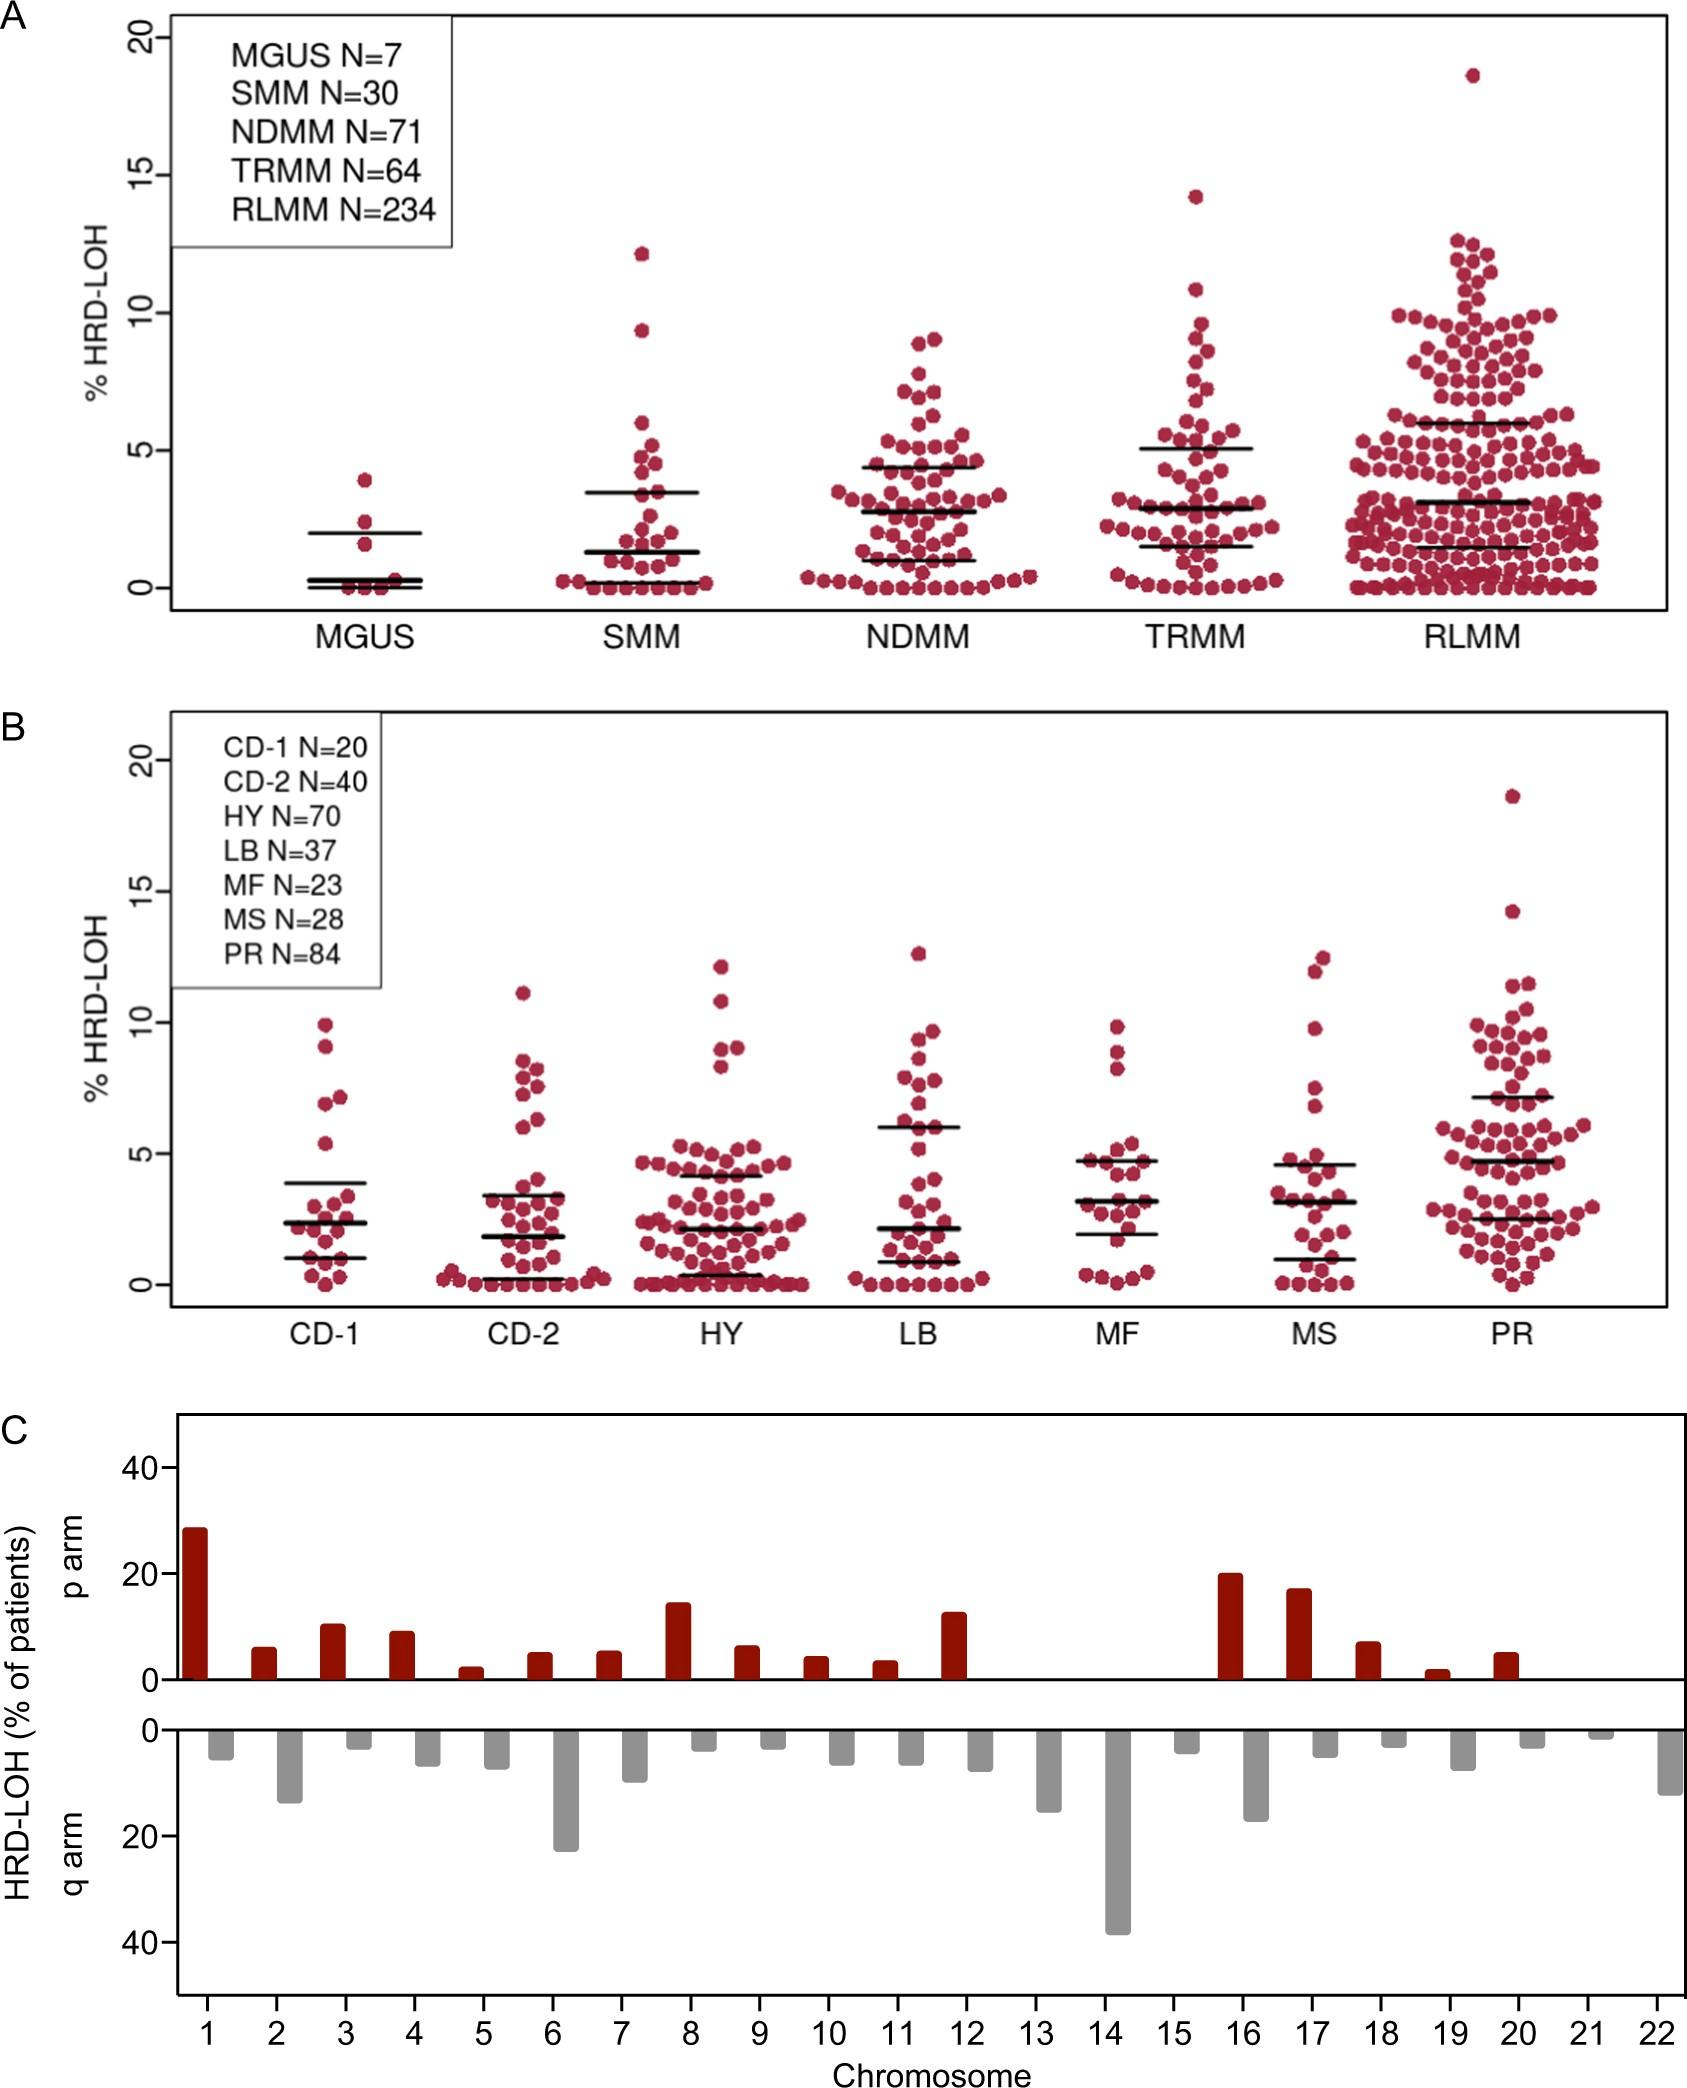 Loss of heterozygosity as a marker of homologous repair